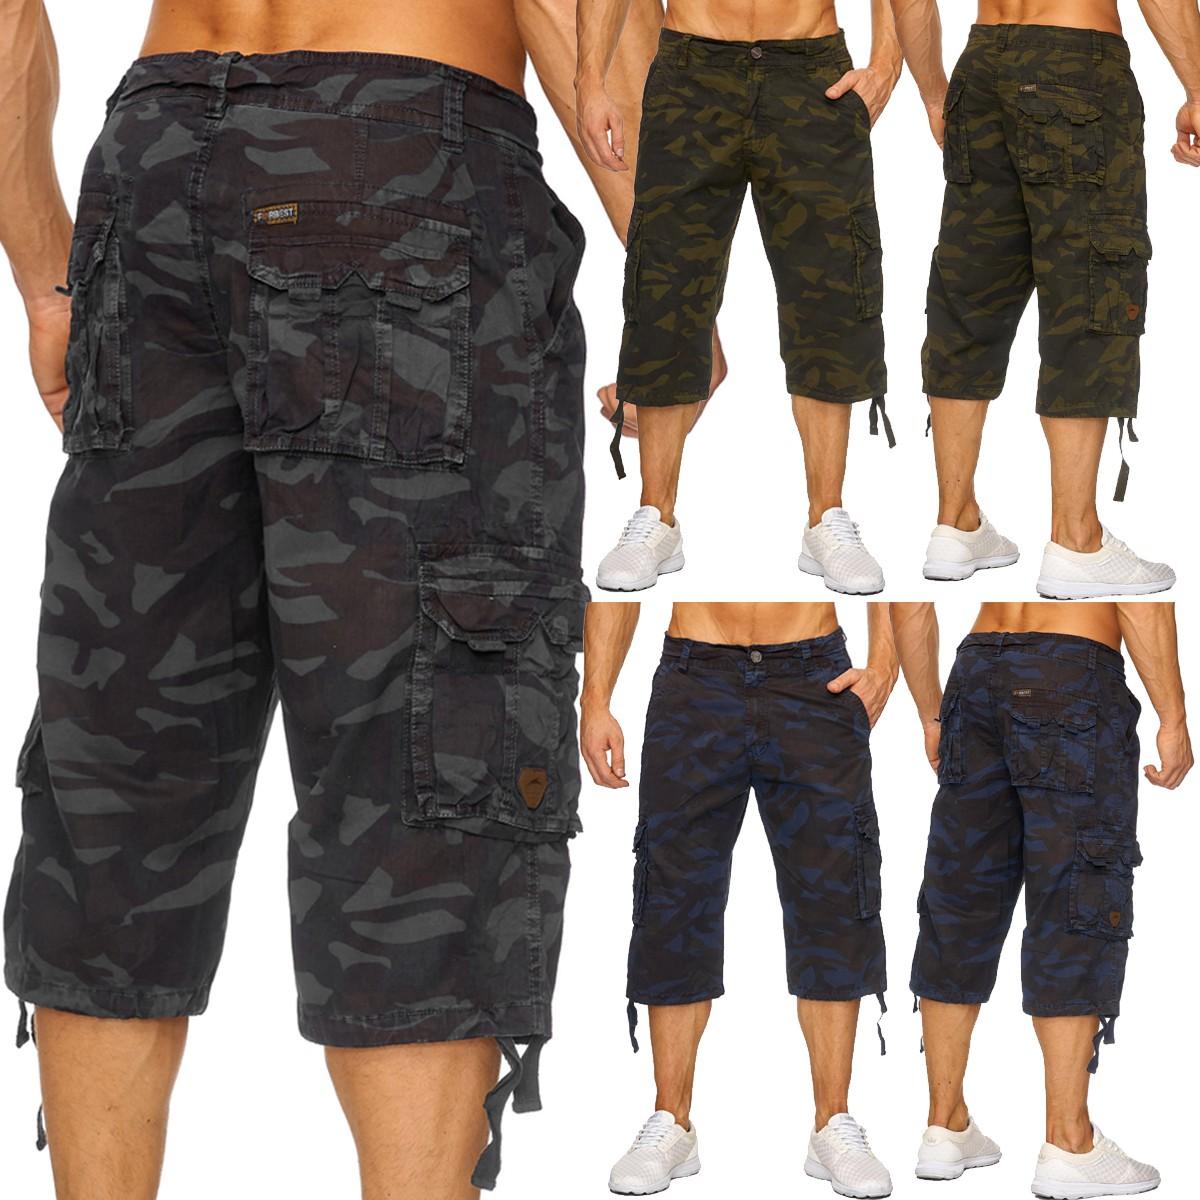 Herren Army Camouflage 3 4 Cargo Shorts kurze Hose Tarnmuster Caprihose  Bermudas - Nr 1739 ad214500f3